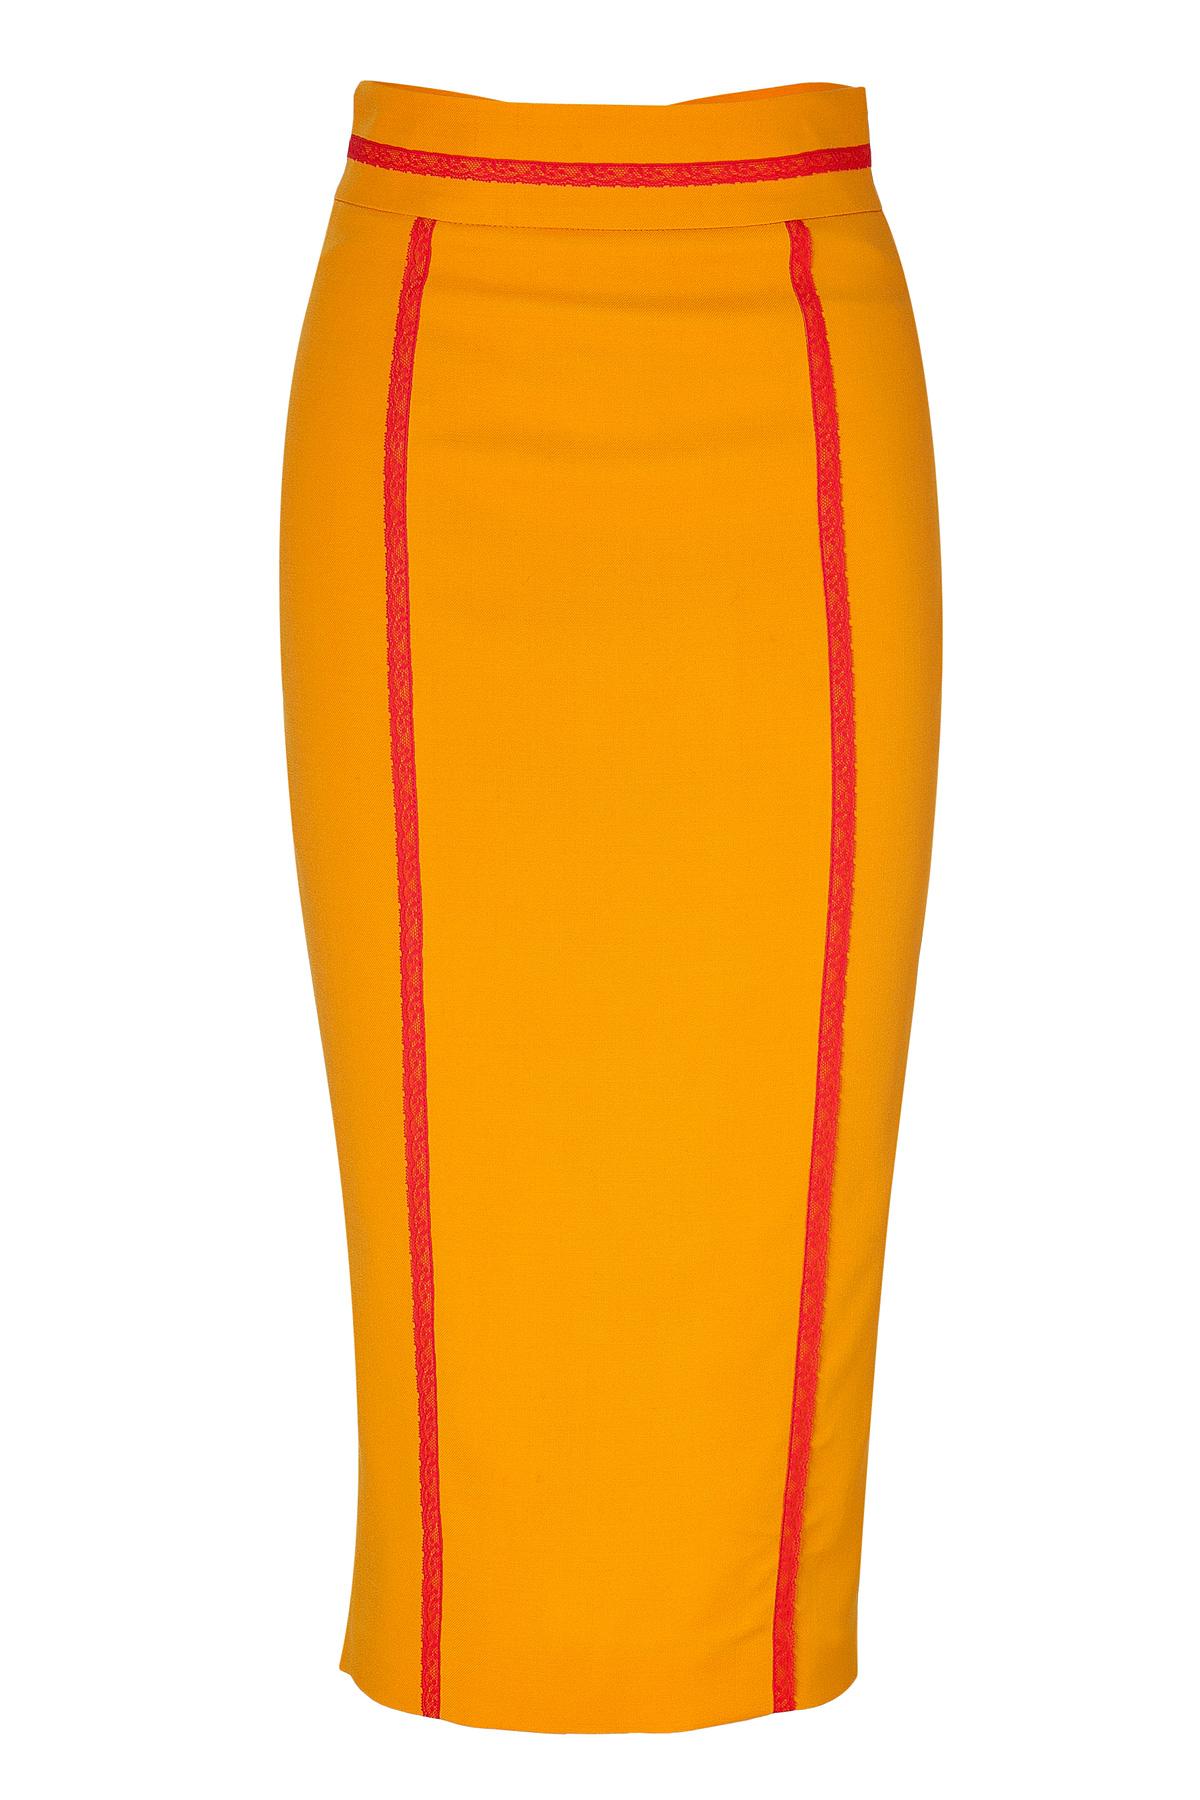 l wren orangemulti high waisted pencil skirt with